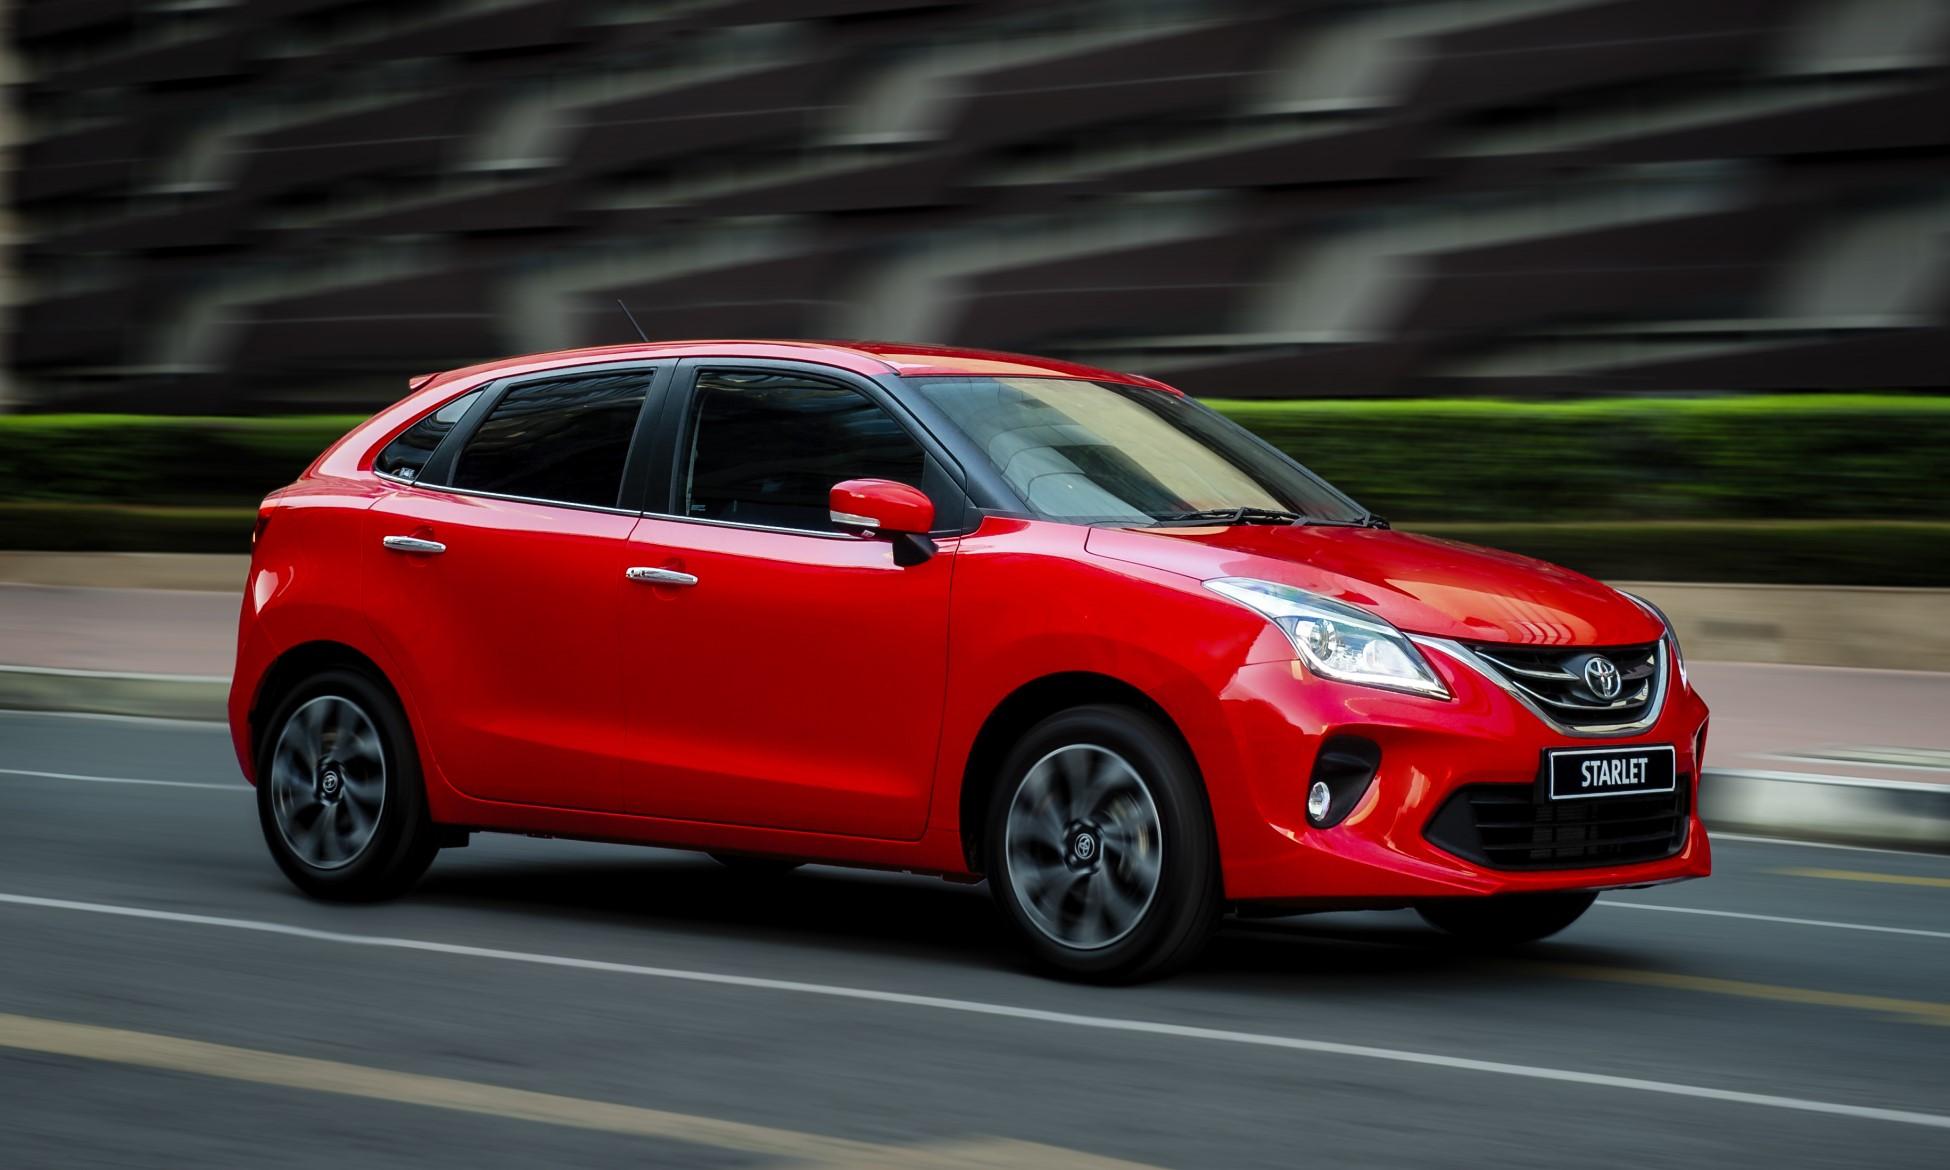 Toyota Starlet 1,4 Xr Driven